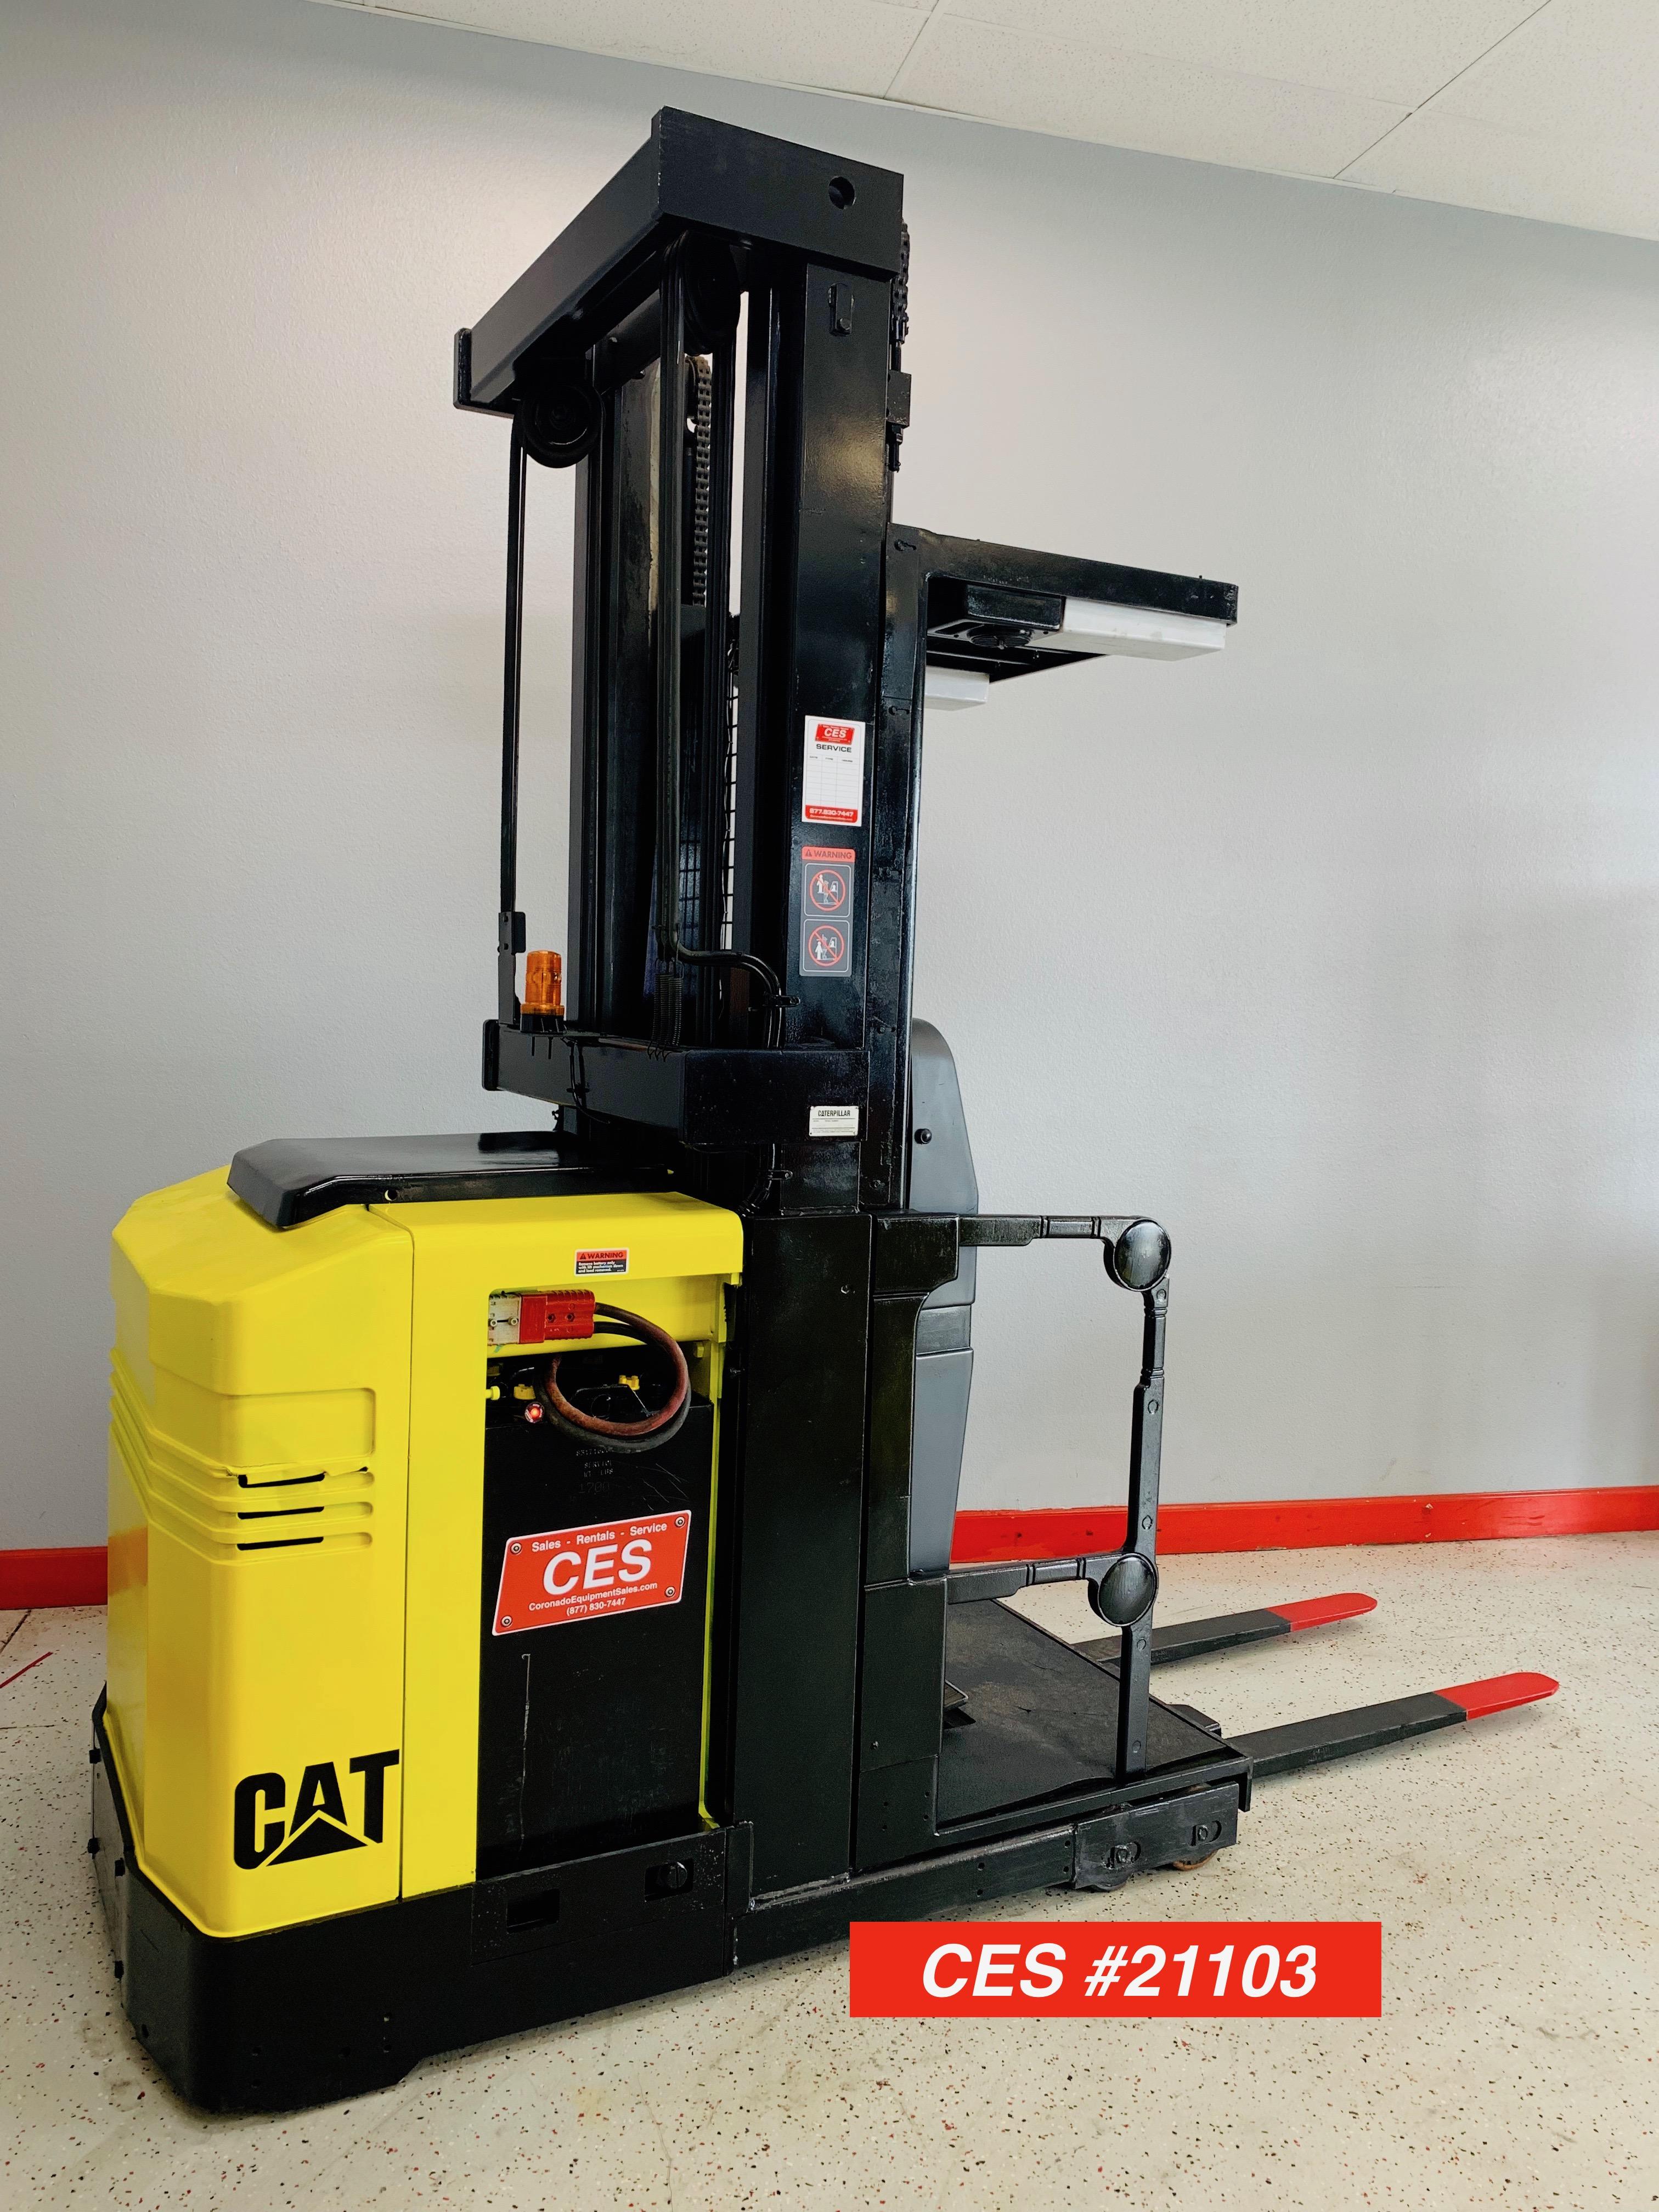 CES #21103 Cat NOR30 Electric Order Picker Forklift